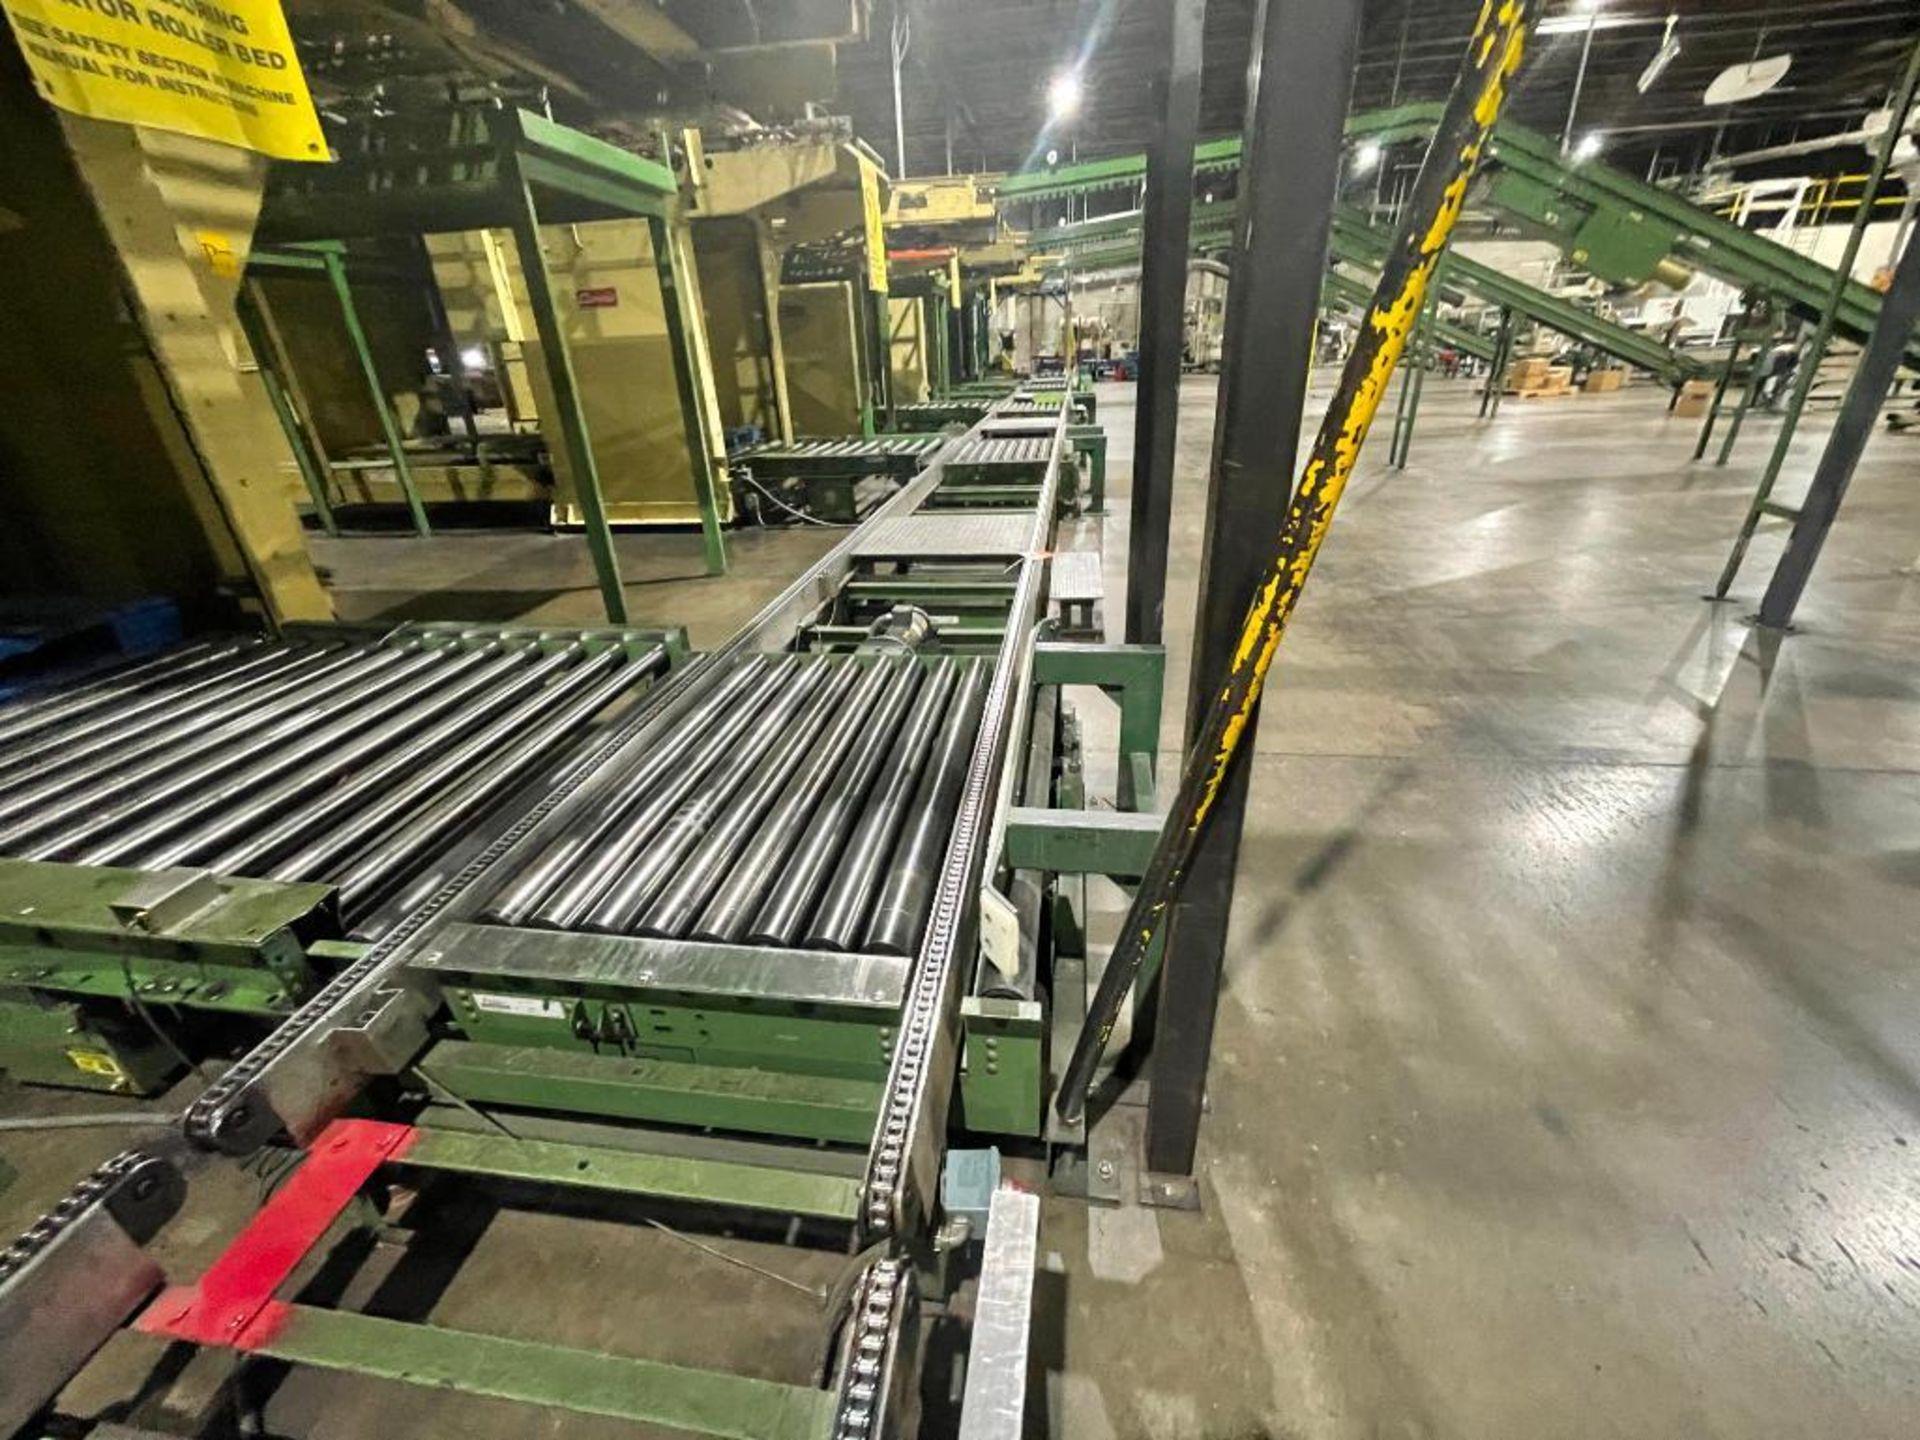 Buschman full pallet conveyor - Image 2 of 12